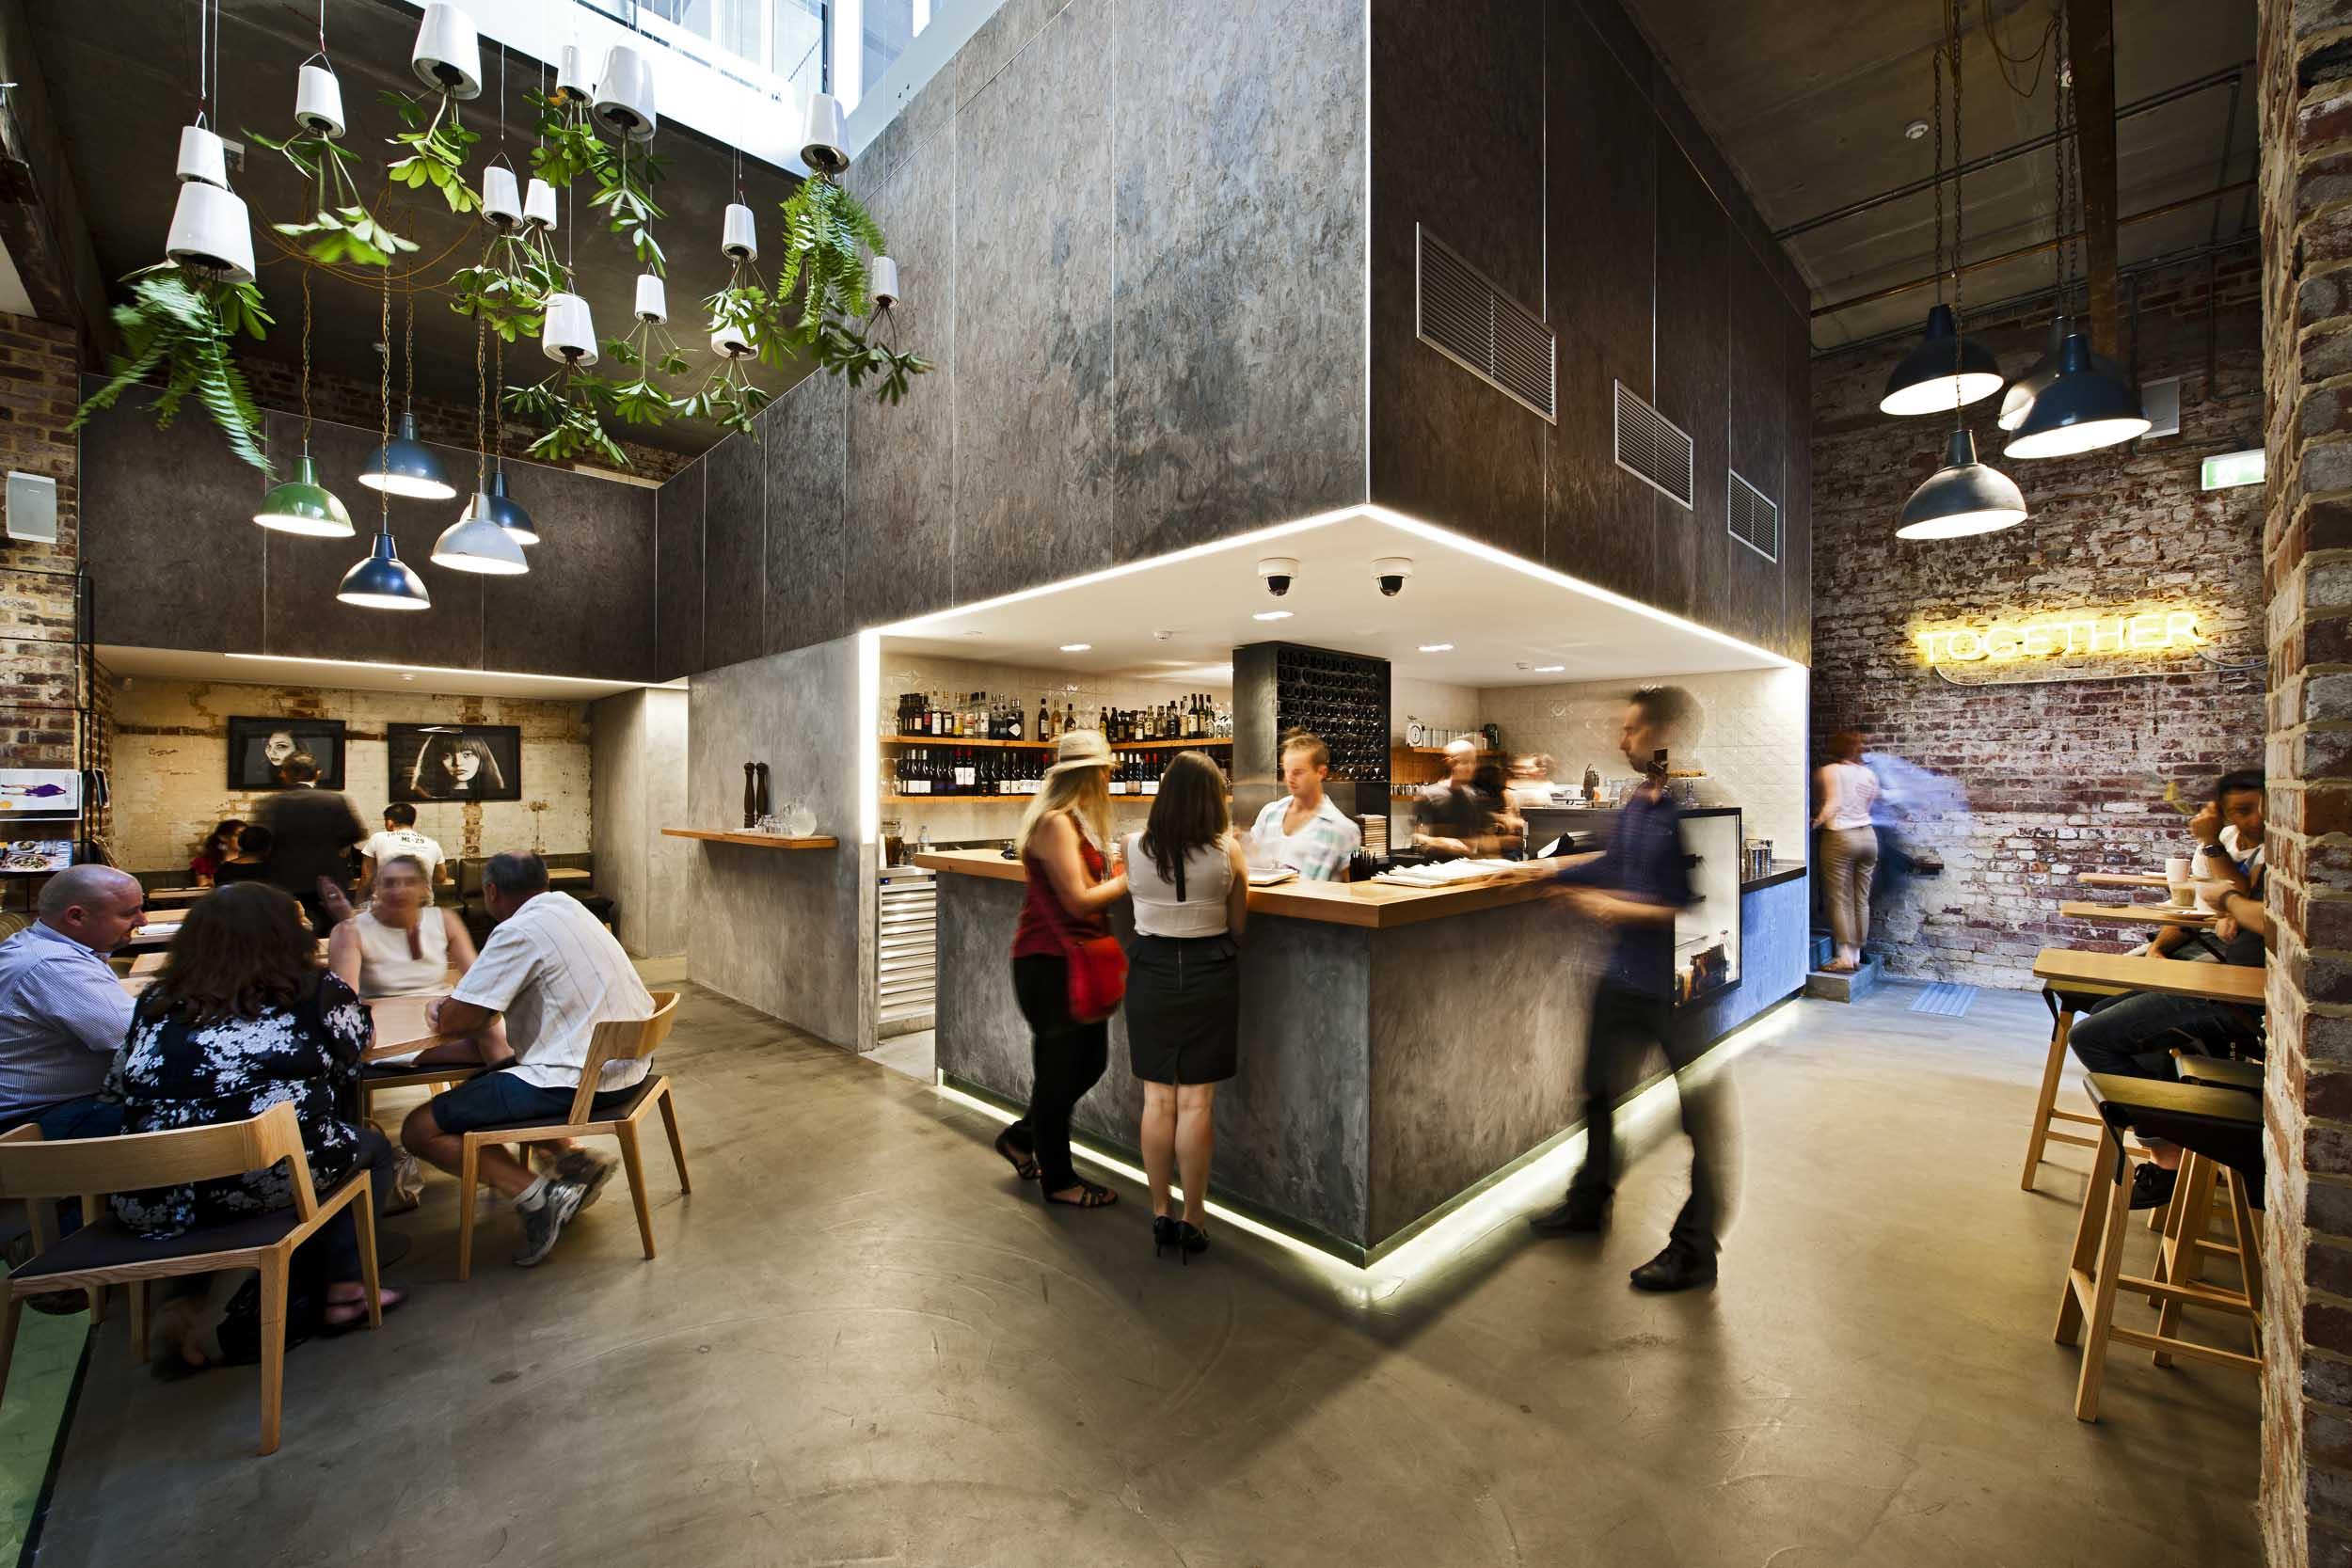 venn-bar-cafe-perth-architecture-design-architect-western-australia-commercial.jpg